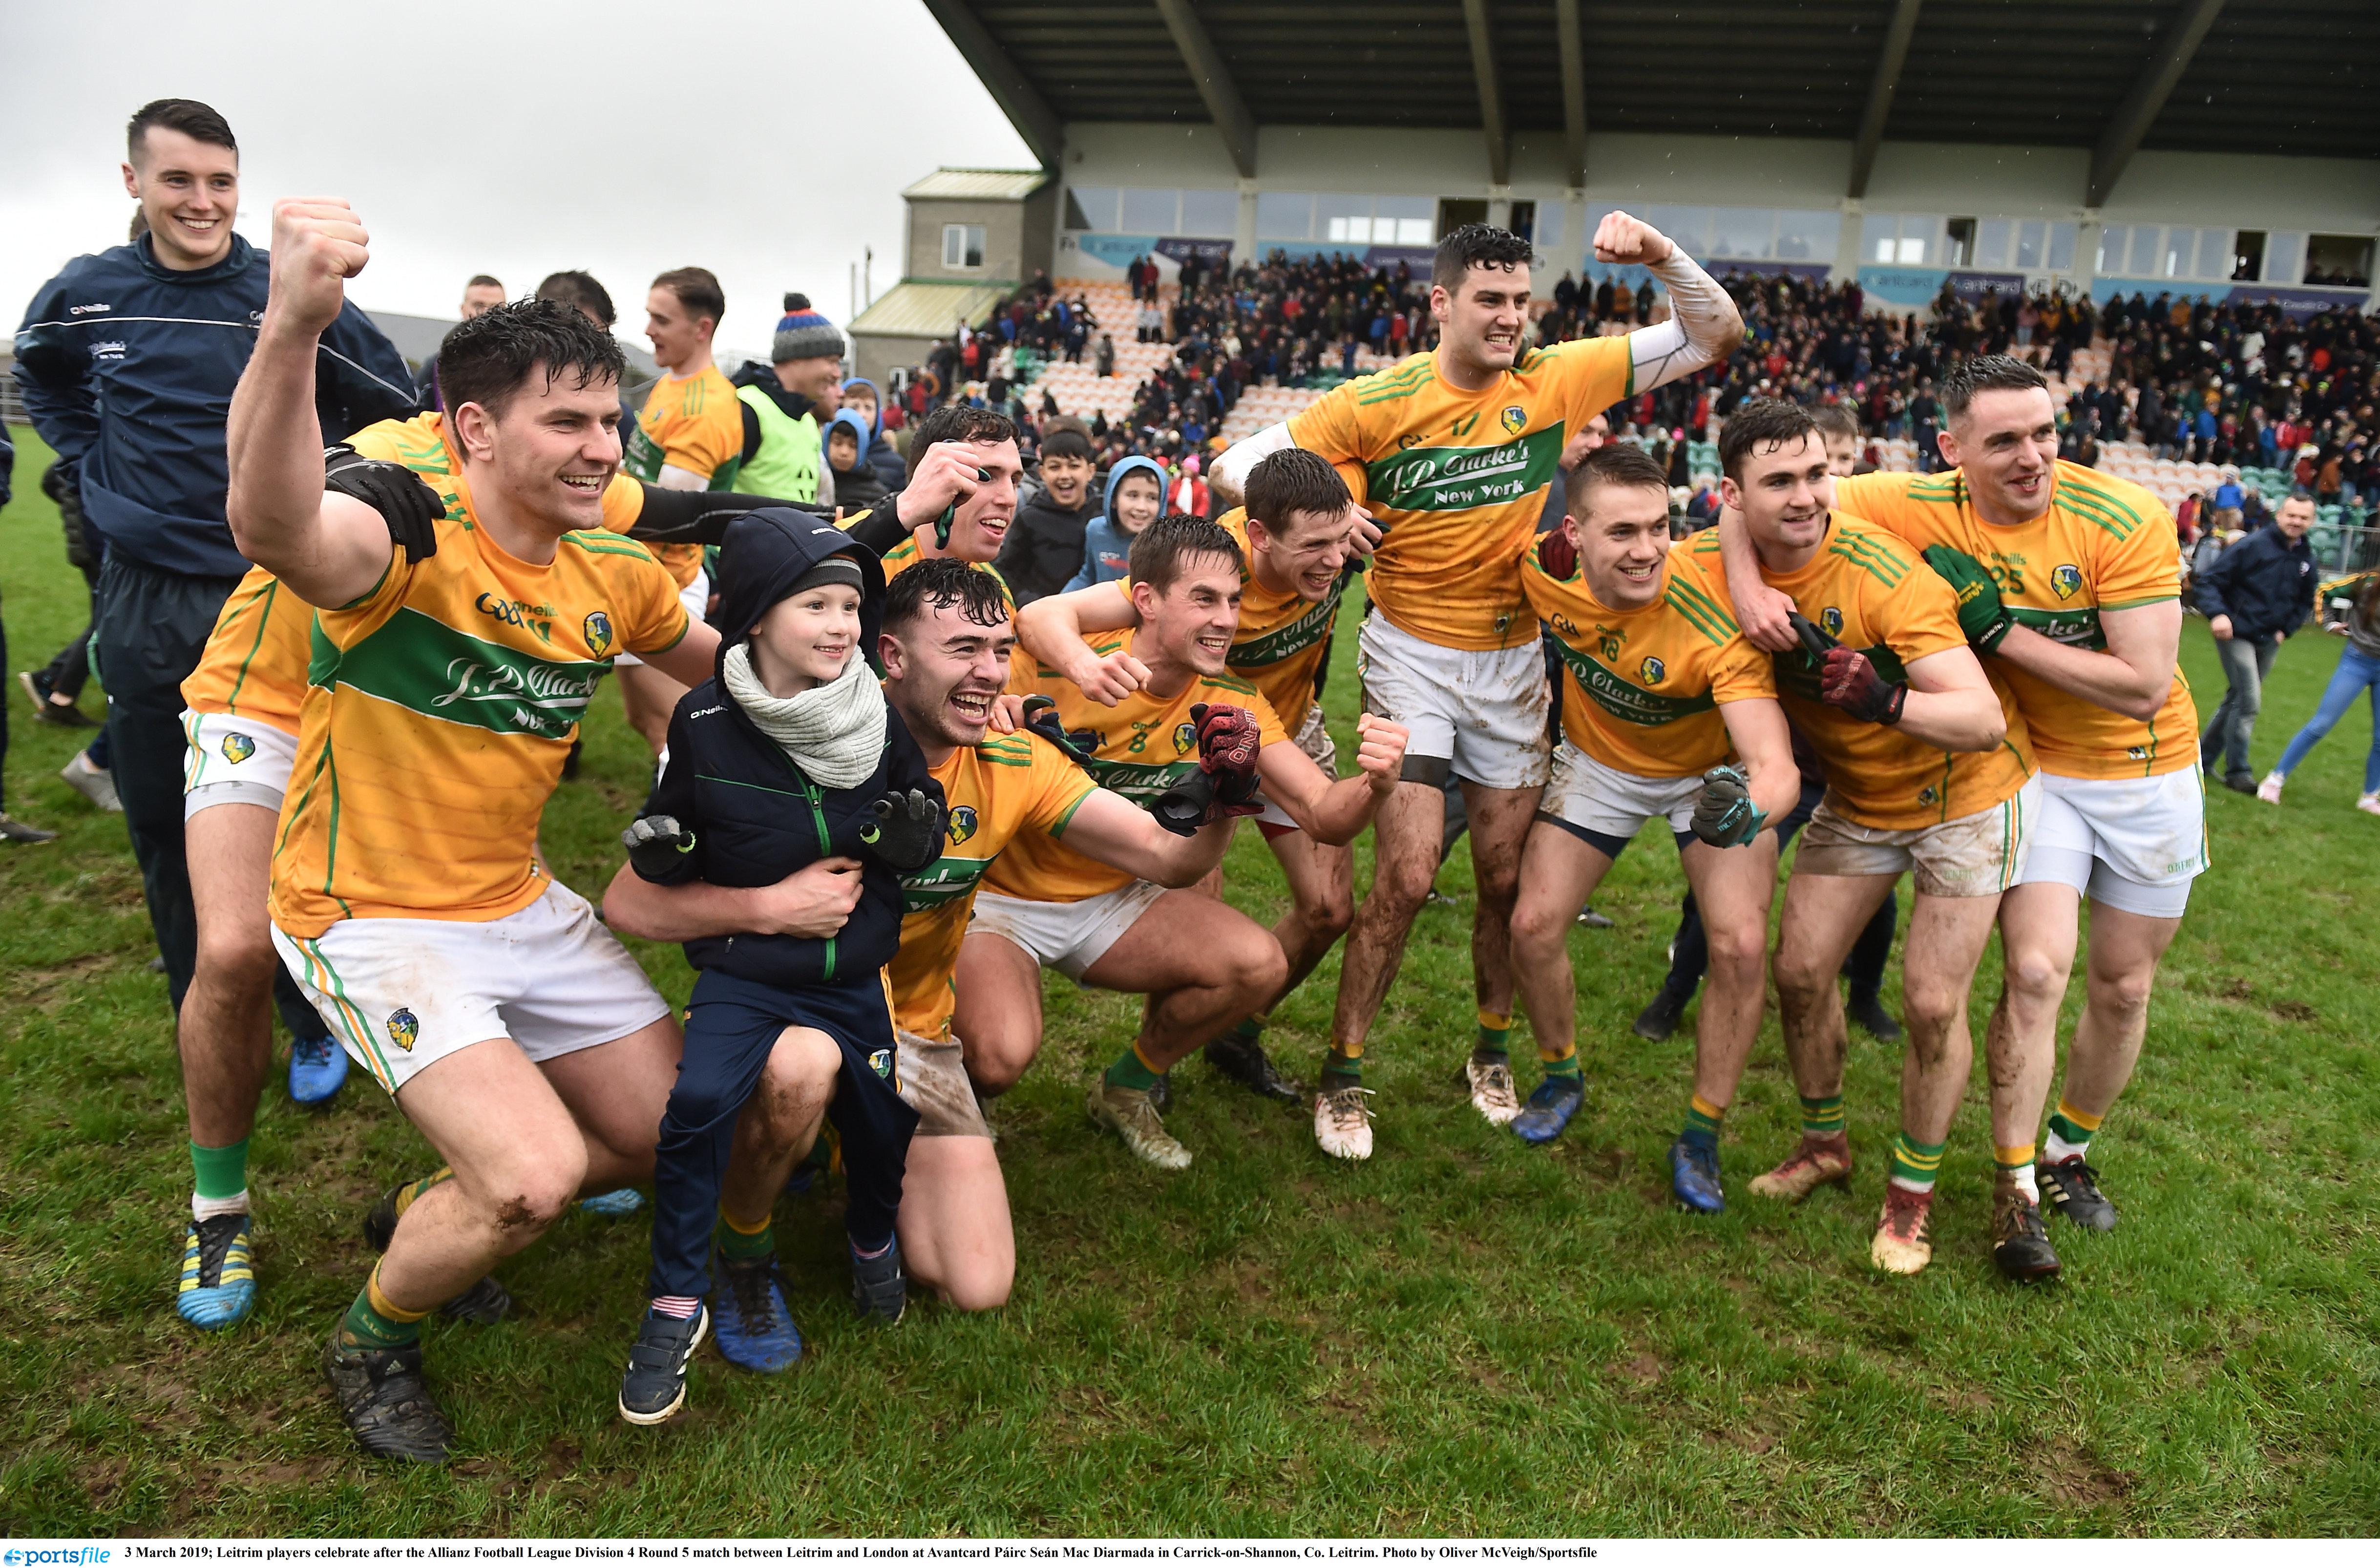 Roundup of Connacht Counties Allianz League Weekends